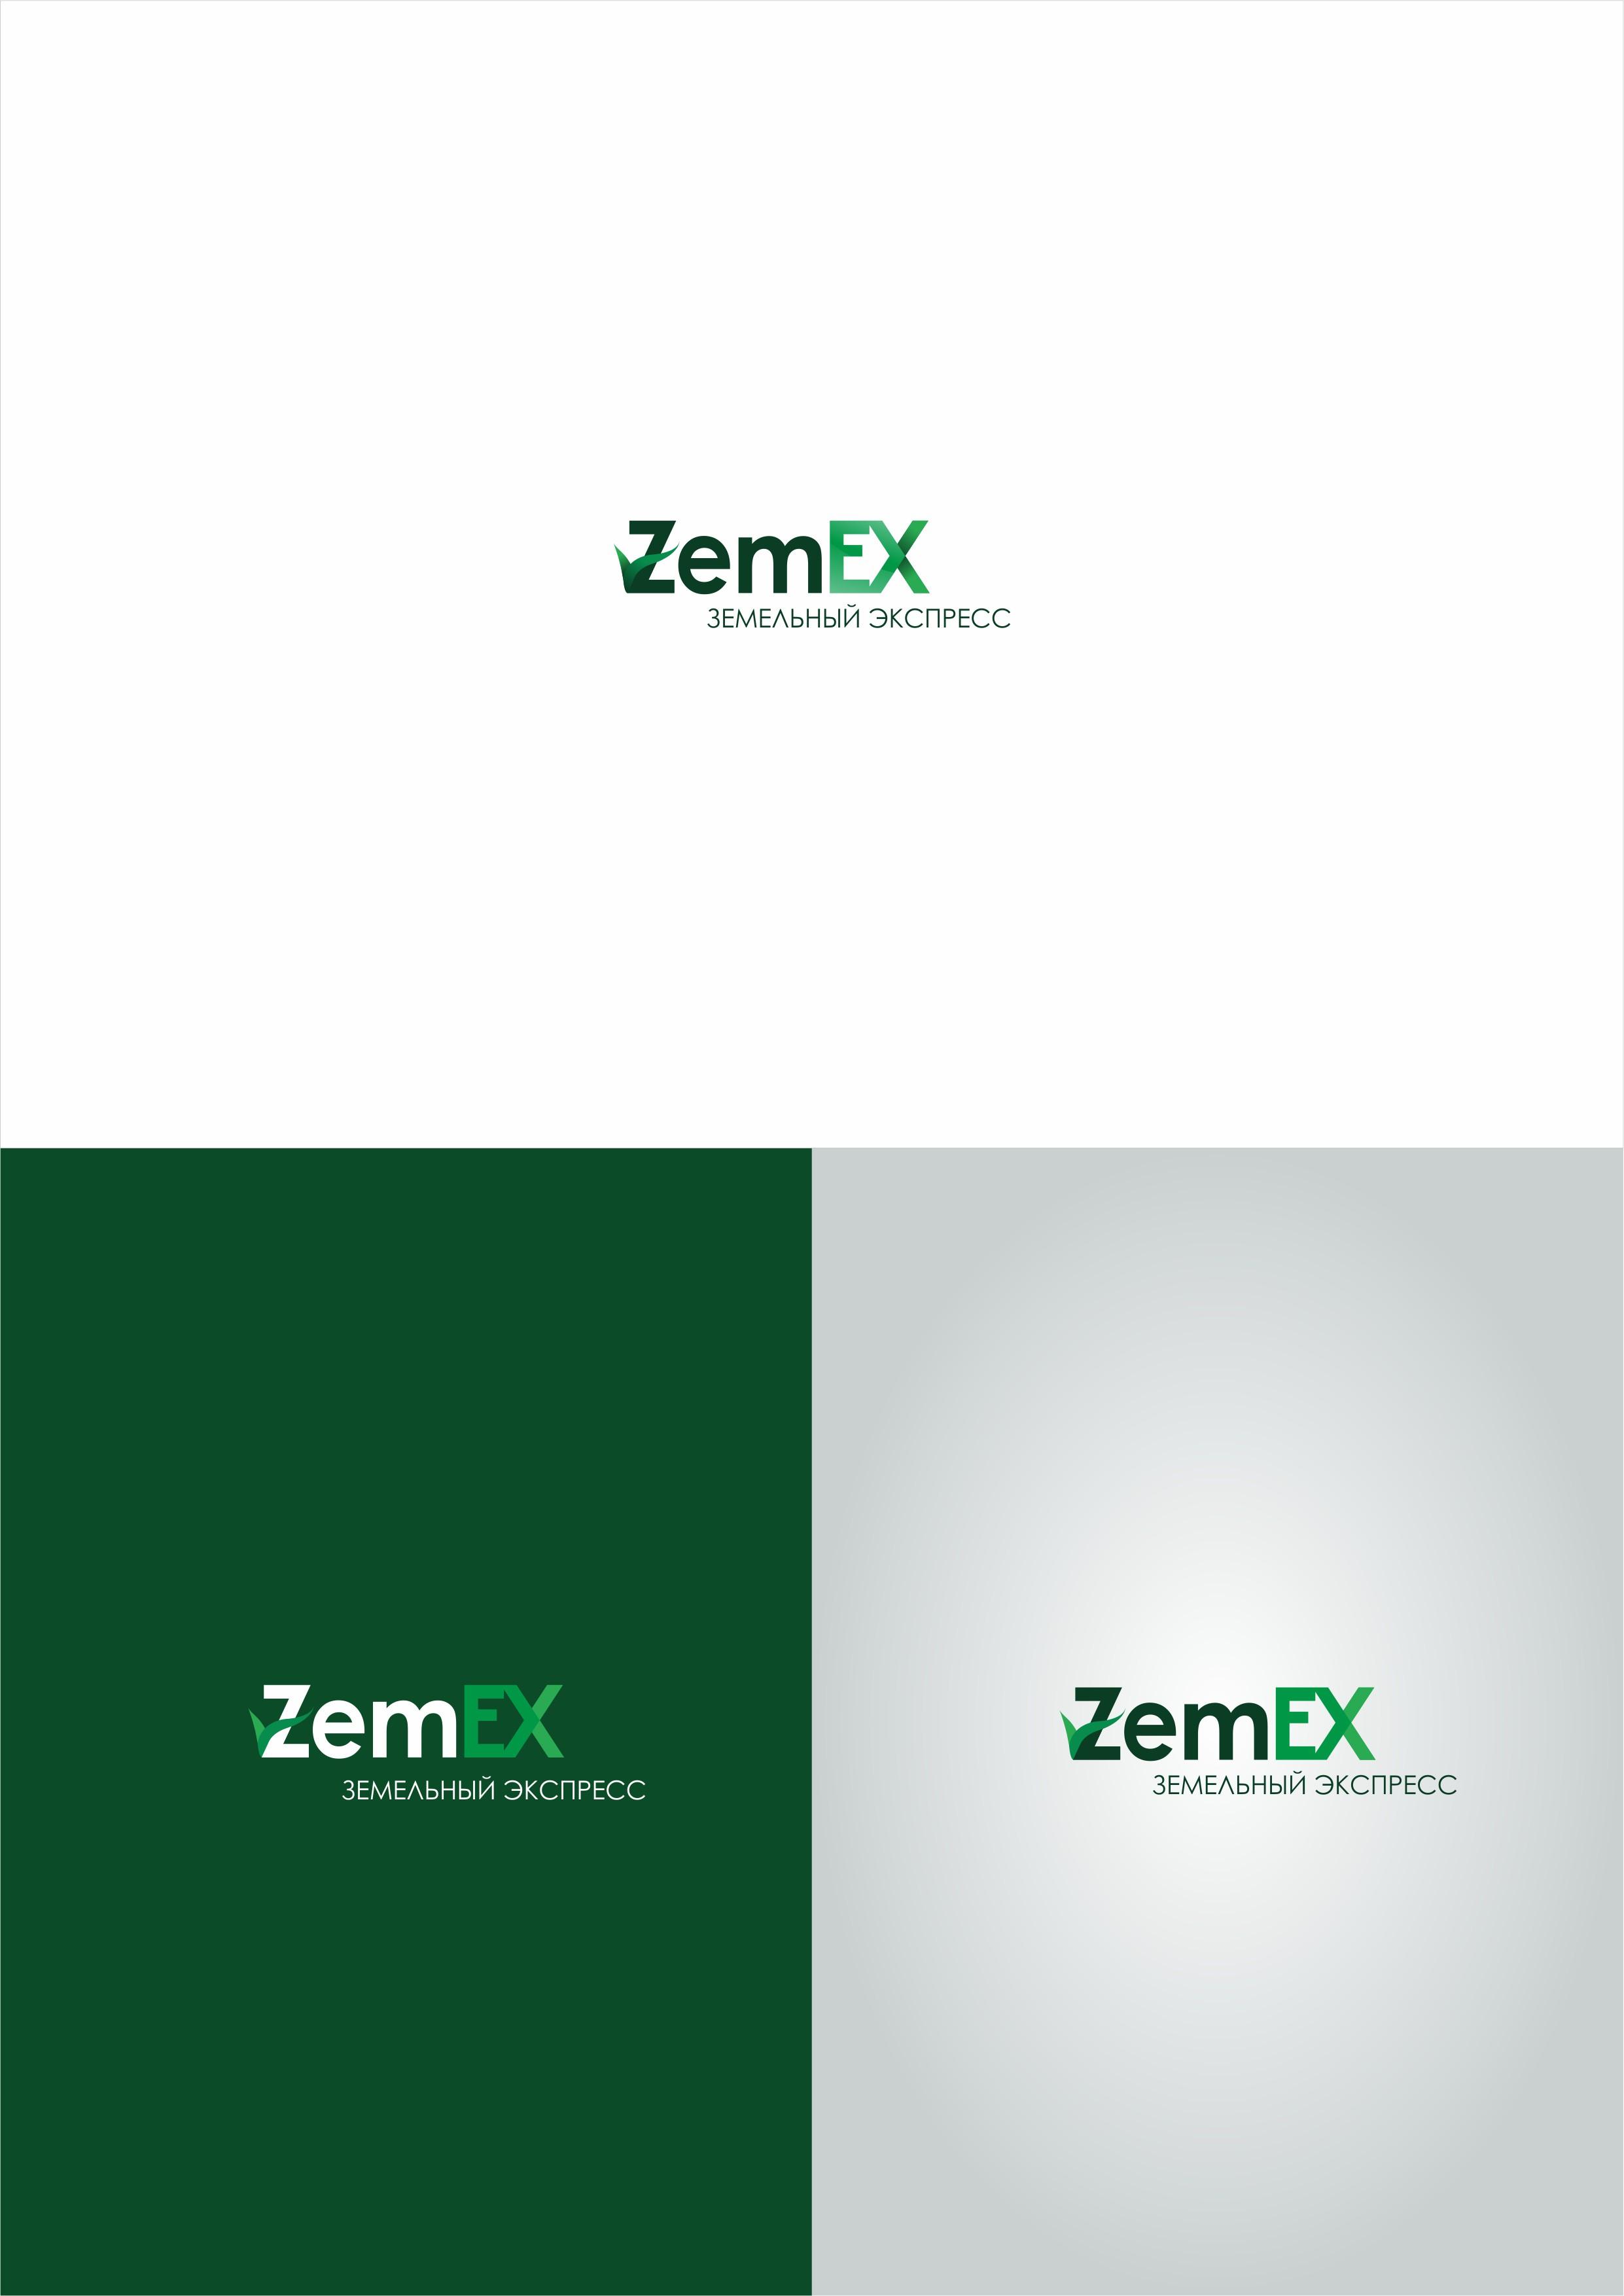 Создание логотипа и фирменного стиля фото f_42259ddf9fc53d52.jpg